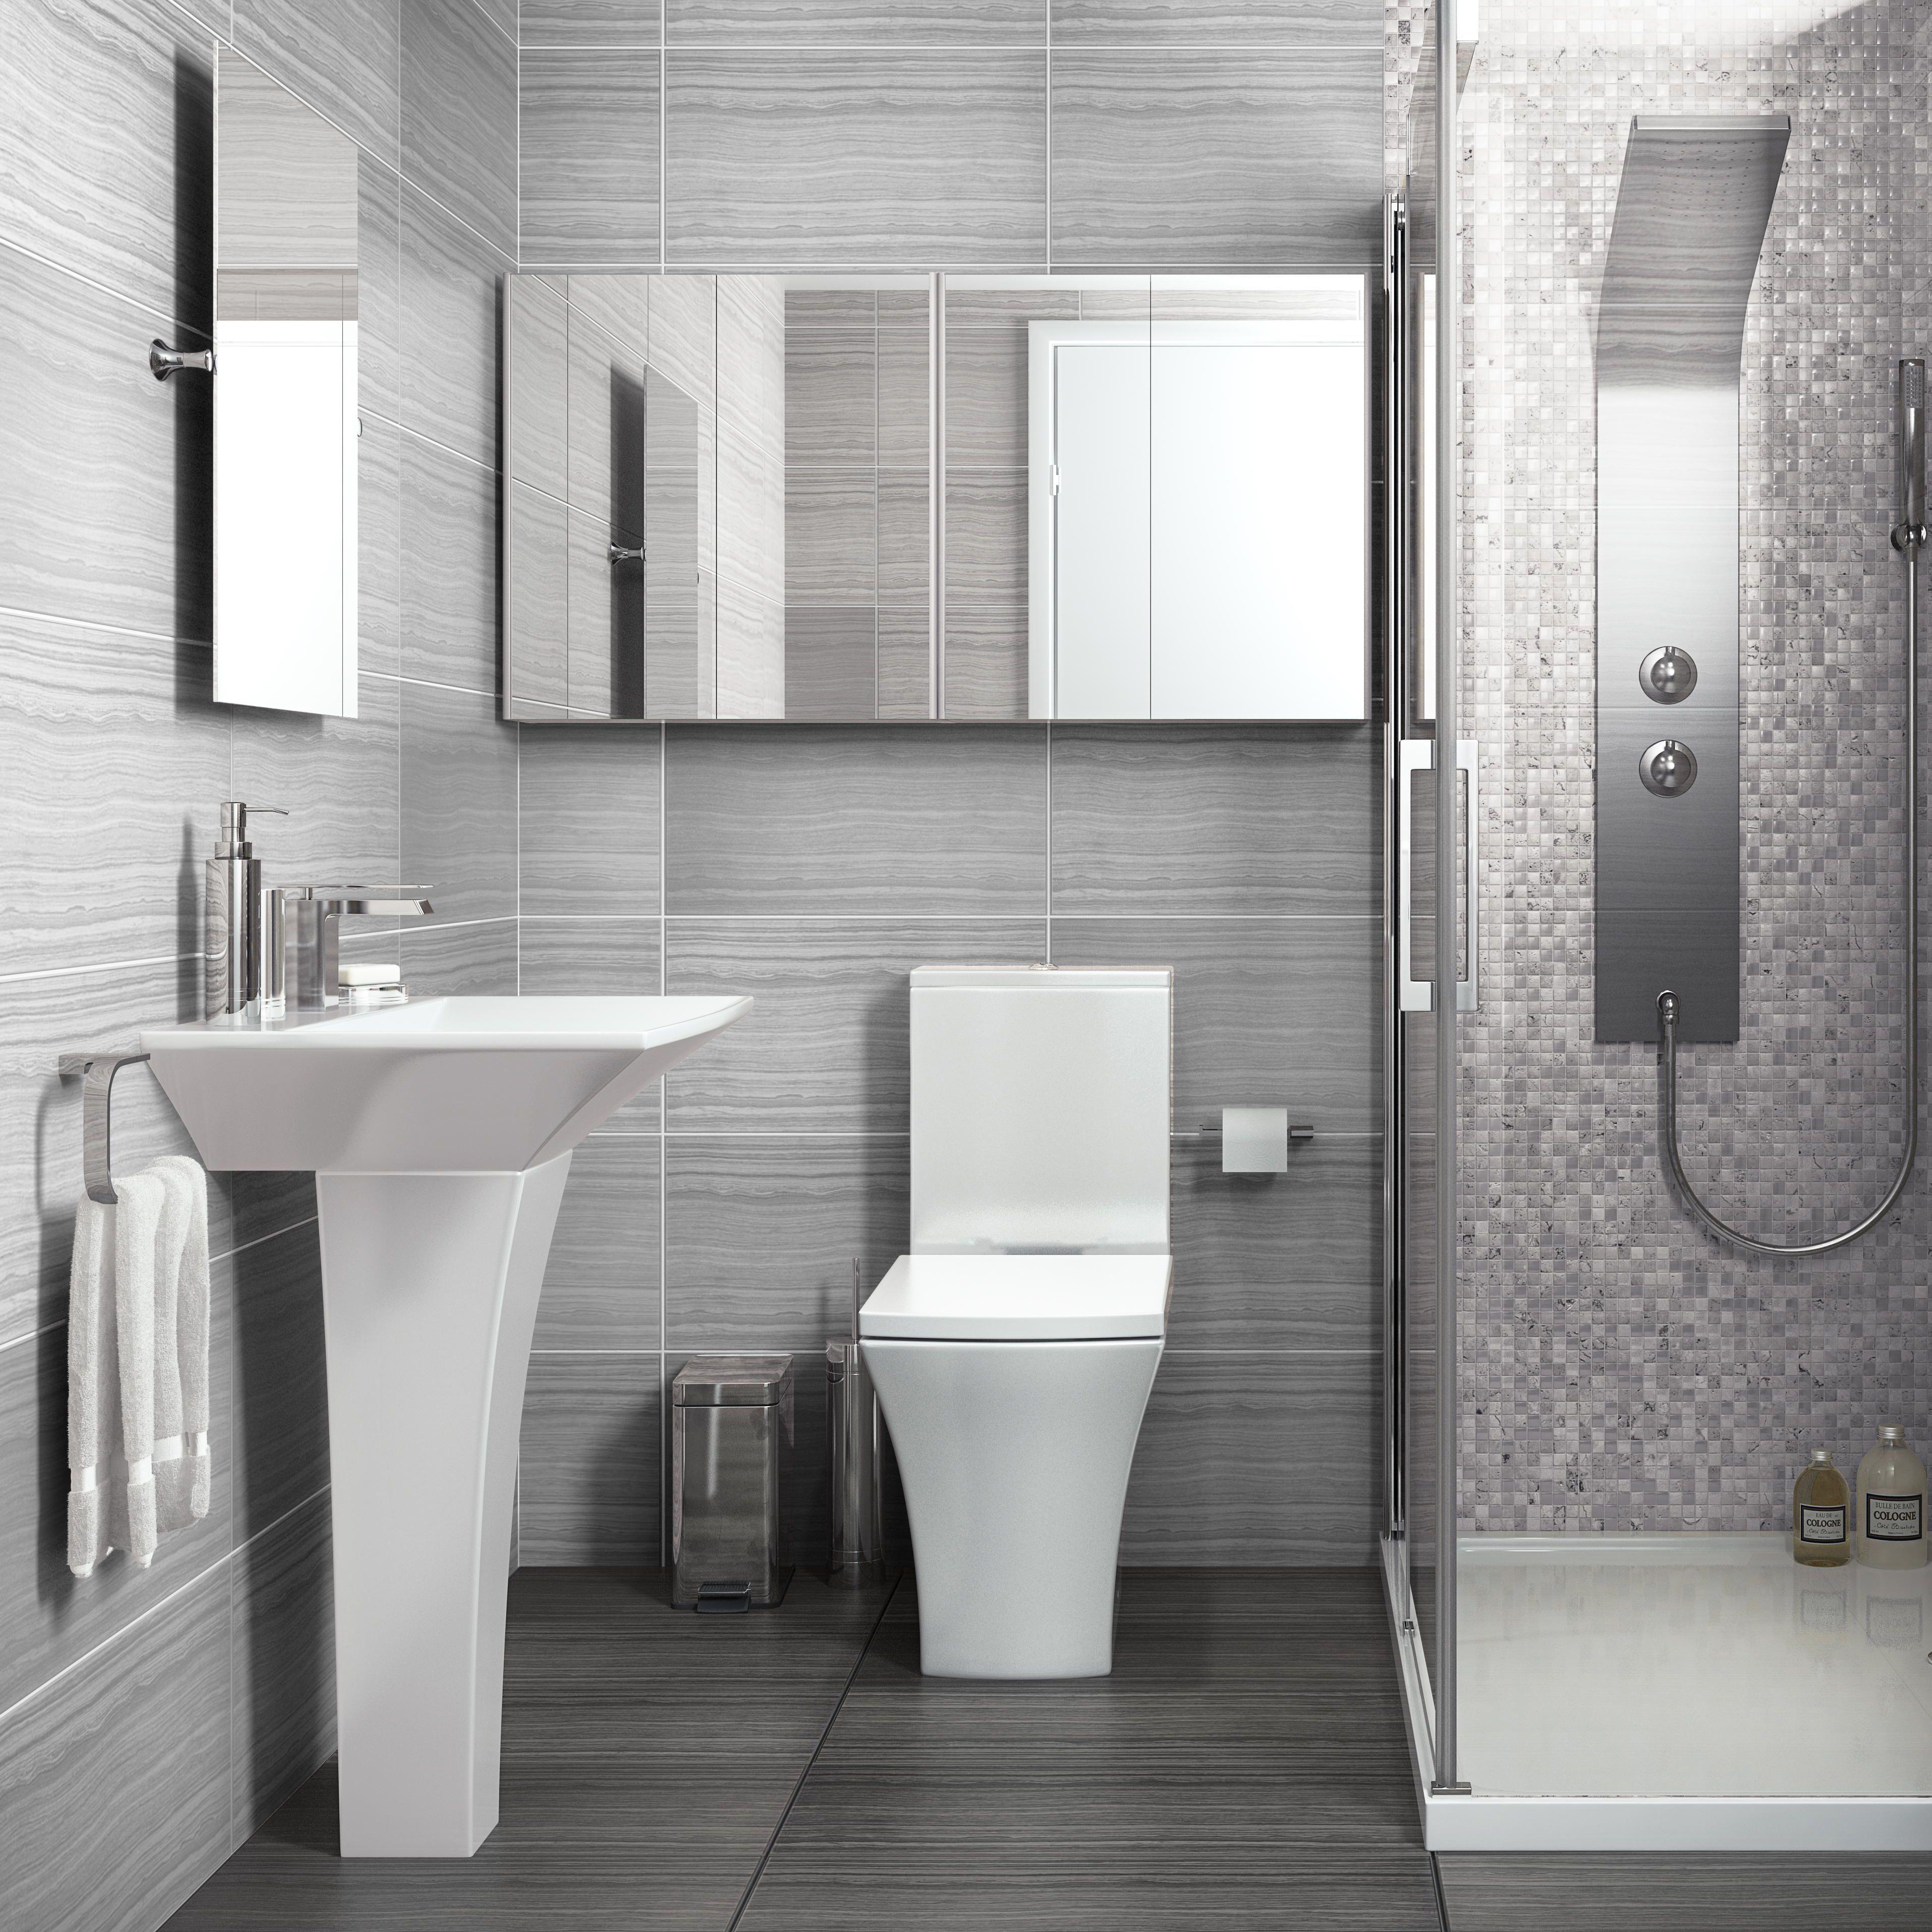 Pin by Emma Pitrakou on Bathrooms in 2020 | Pedestal basin ...